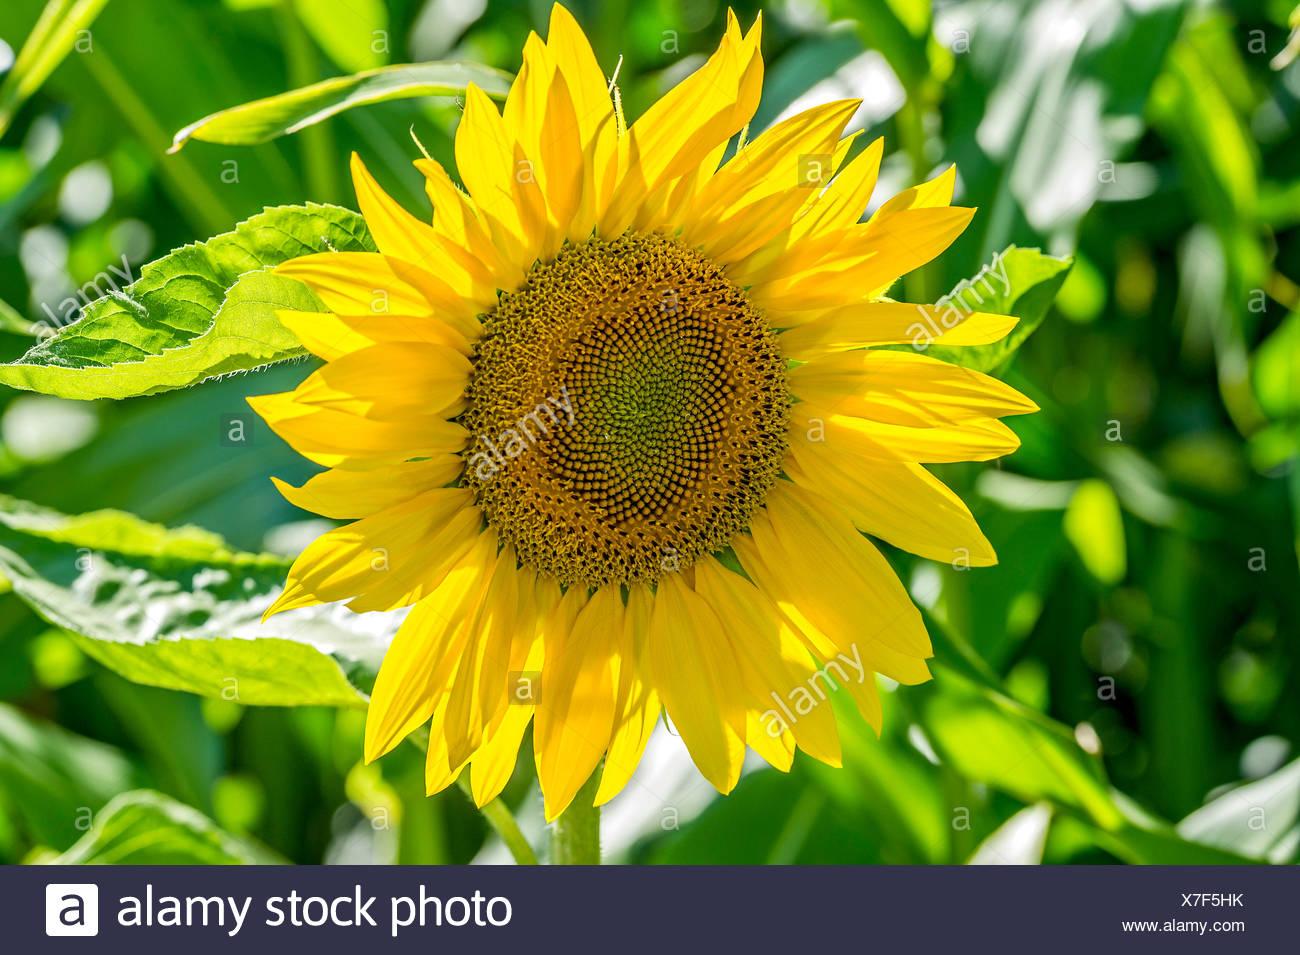 Sunflower (Helianthus annuus), Bavaria, Germany - Stock Image